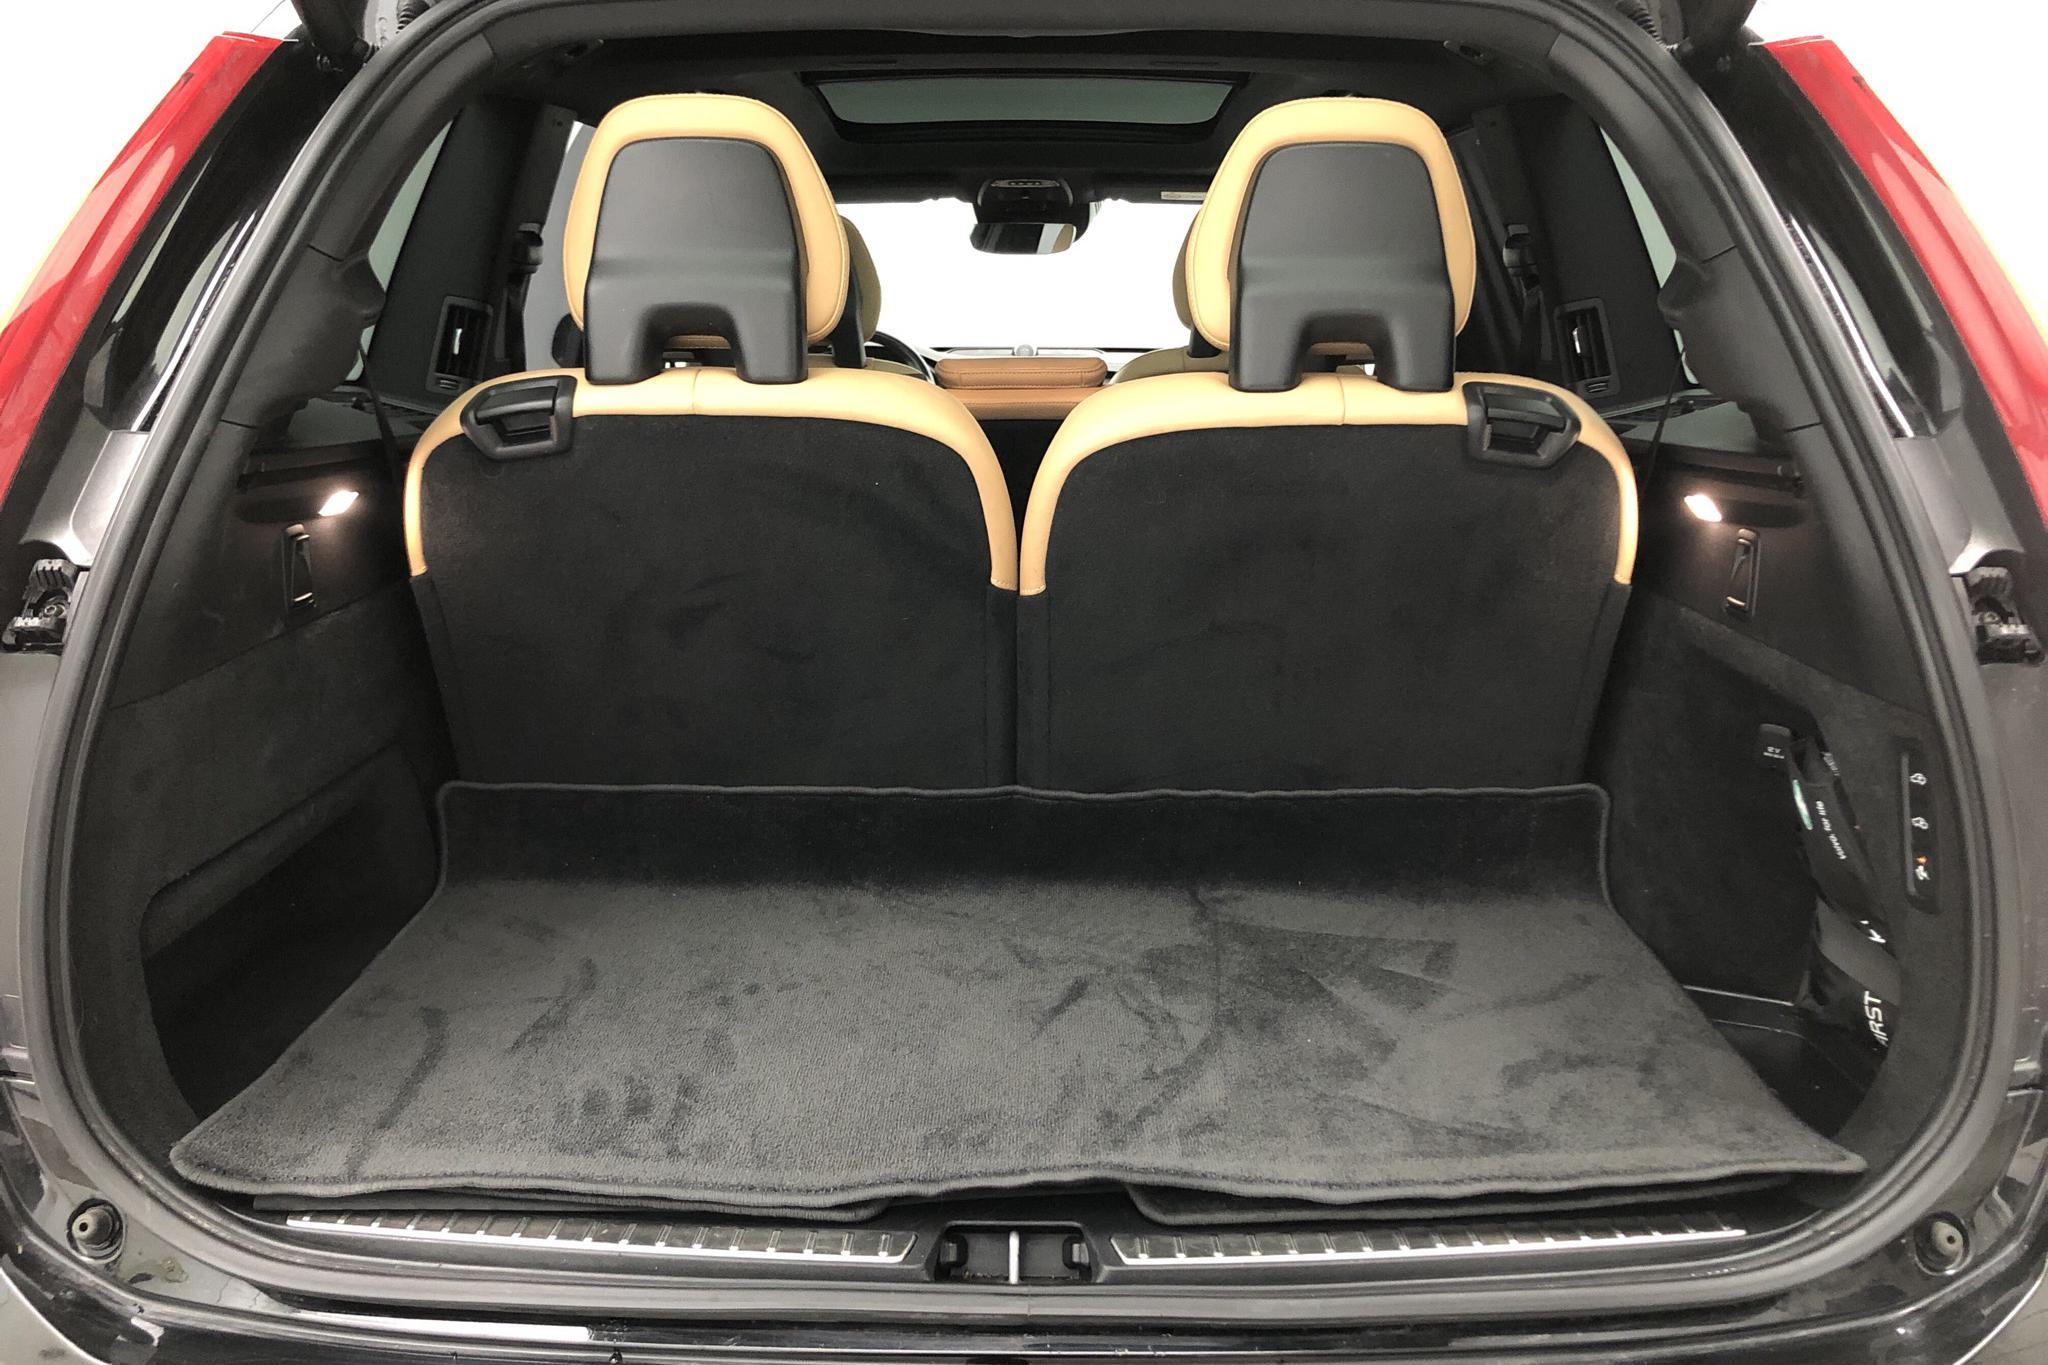 Volvo XC90 T8 AWD Twin Engine (400hk) - 68 340 km - Automatic - black - 2017